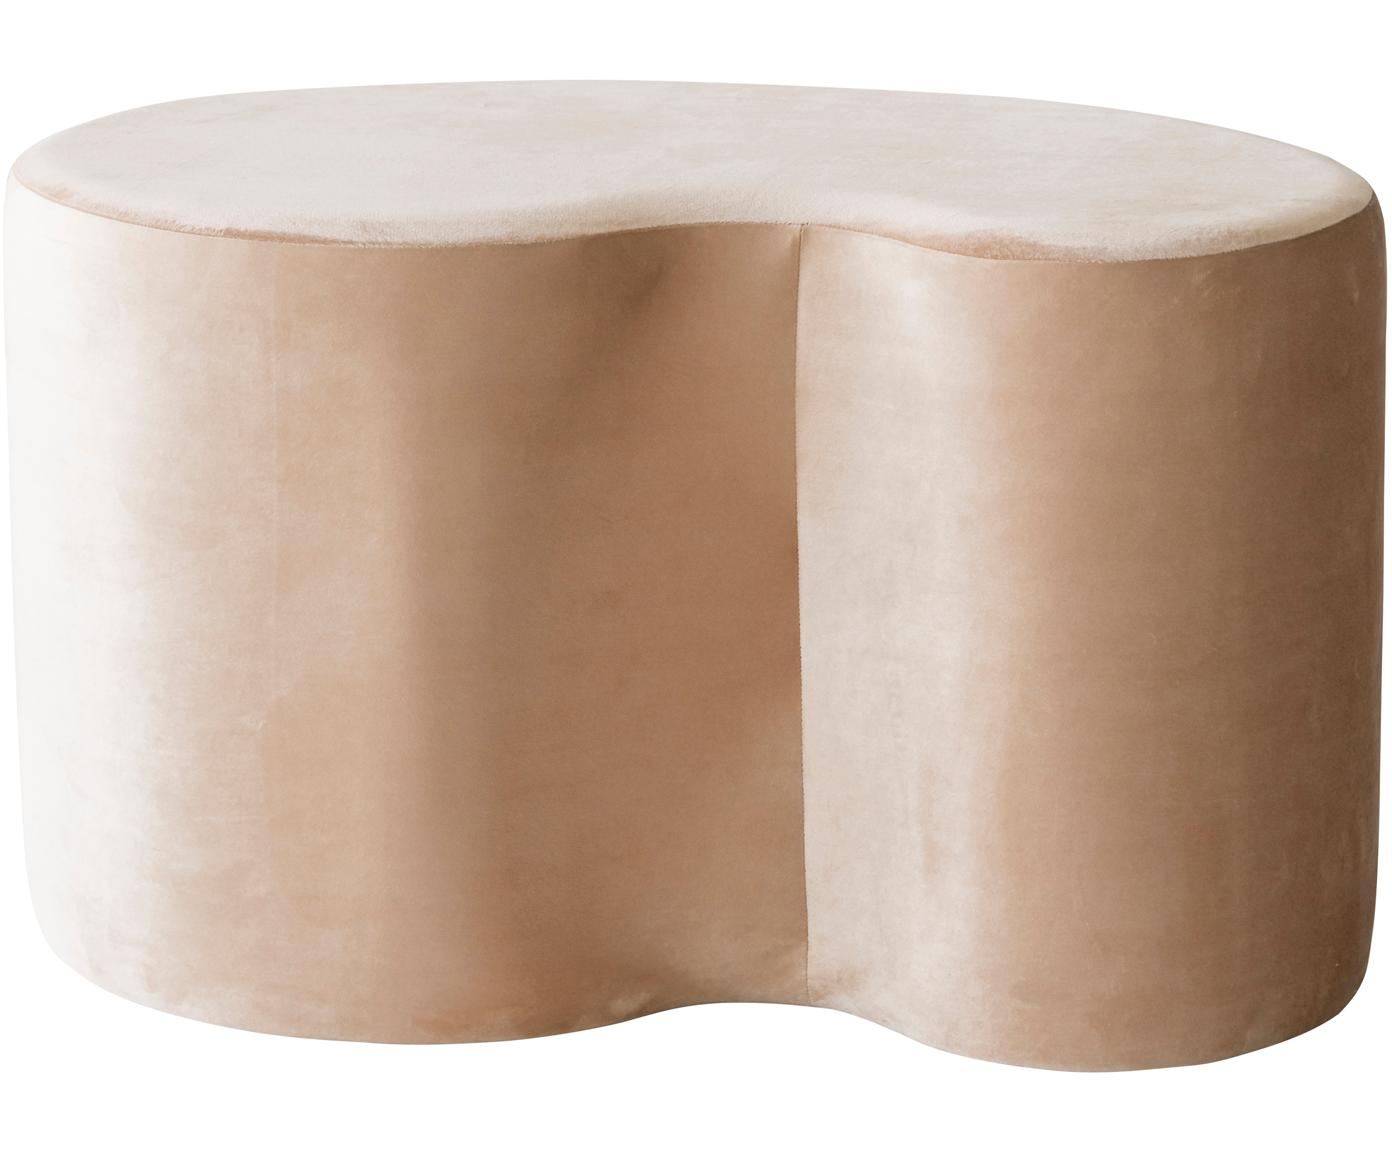 Kruk Cloe, Polyester, Beige, B 80 x D 50 cm